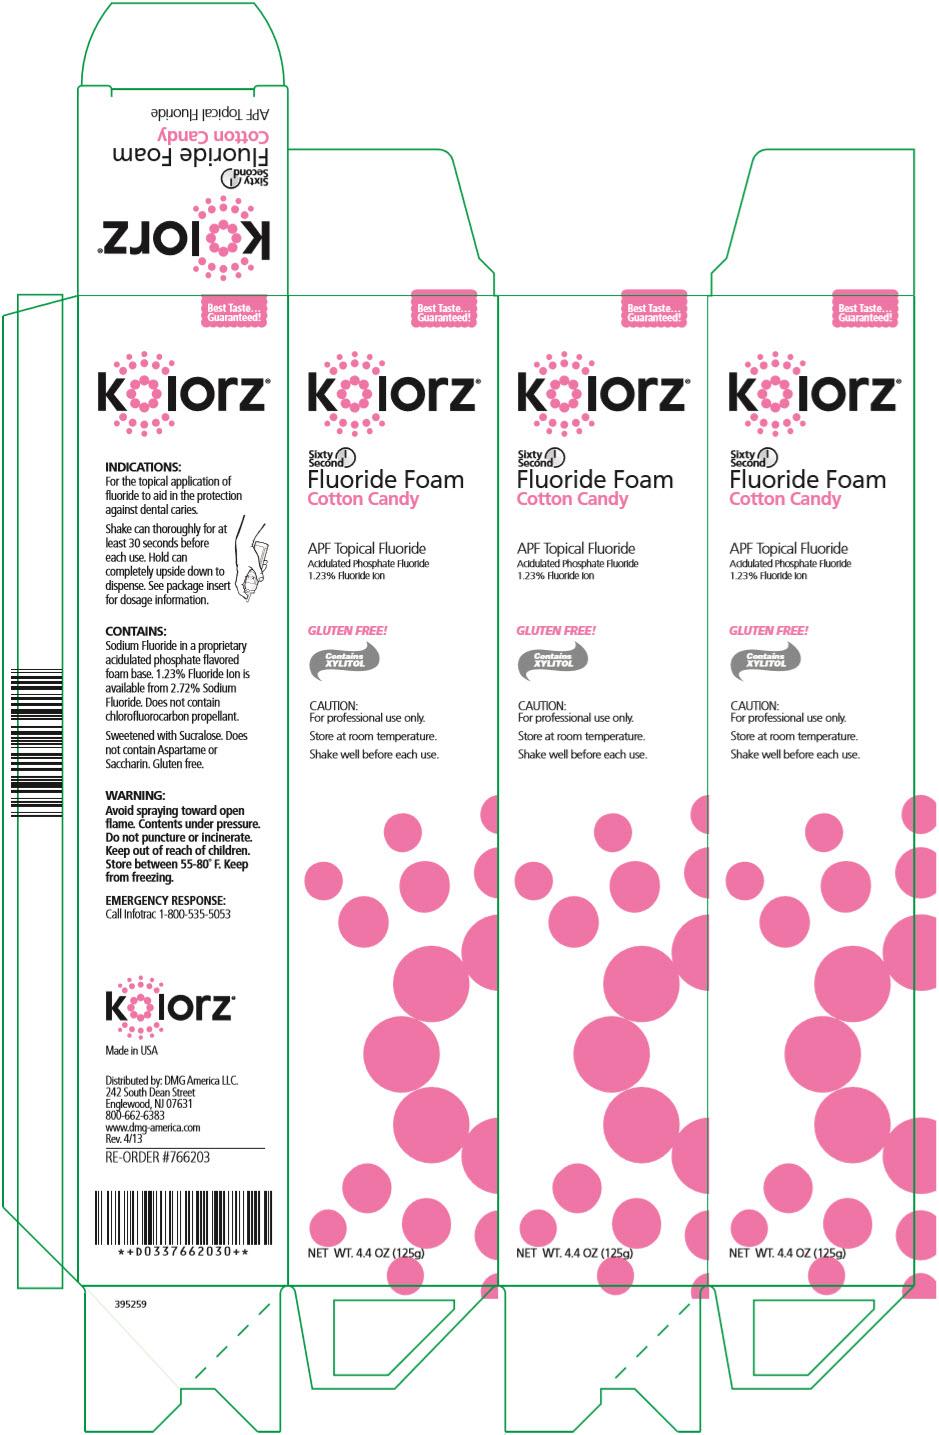 PRINCIPAL DISPLAY PANEL - 125 g Can Carton - Cotton Candy